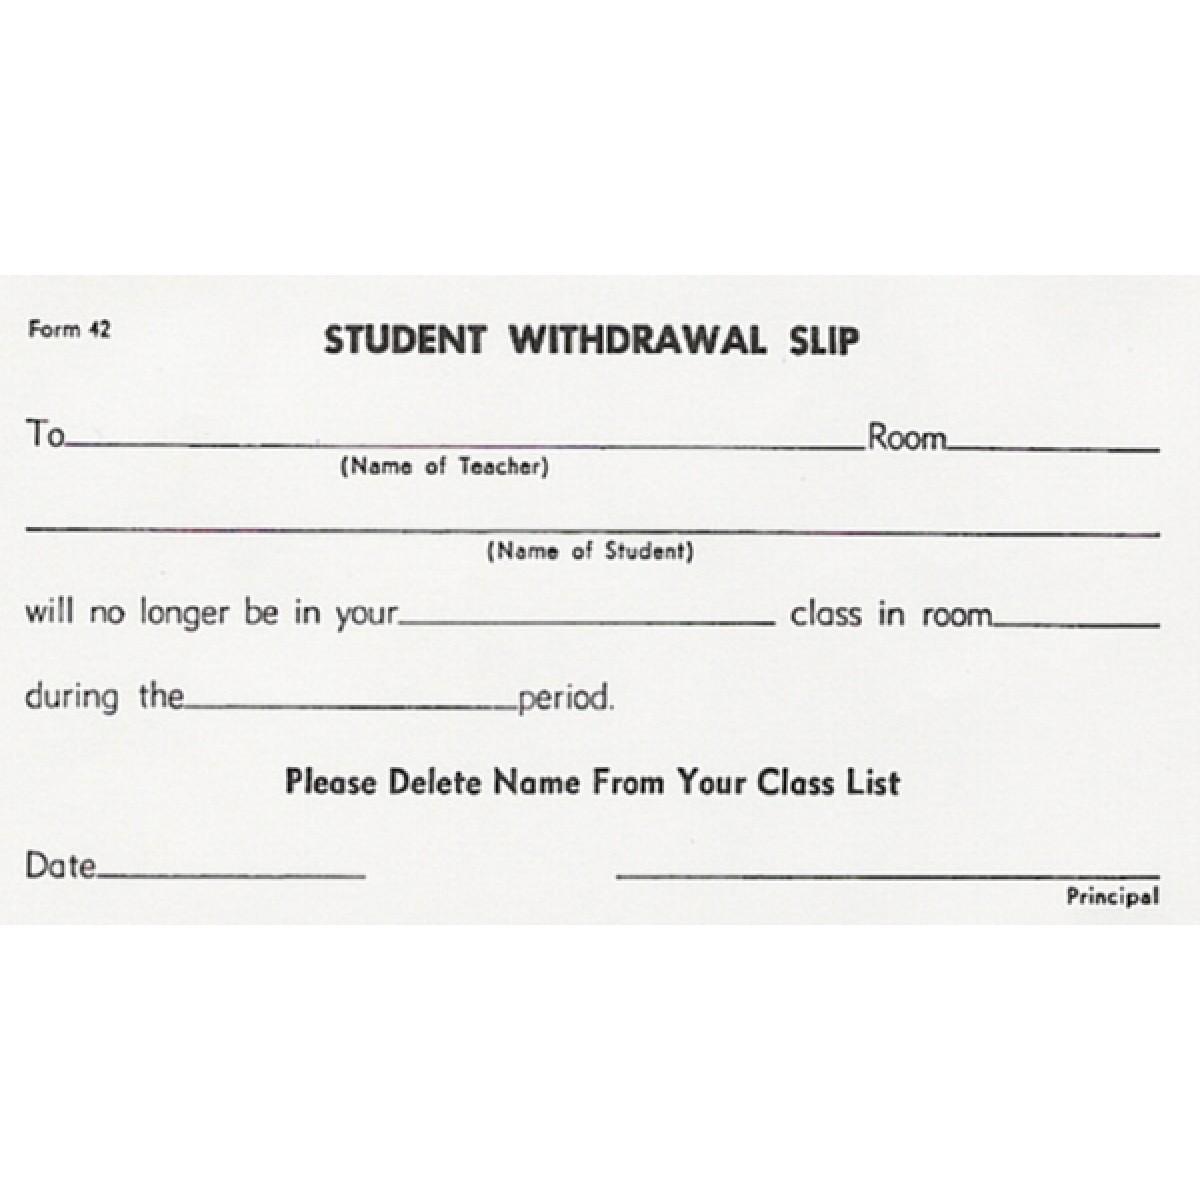 42 - student withdrawal slip